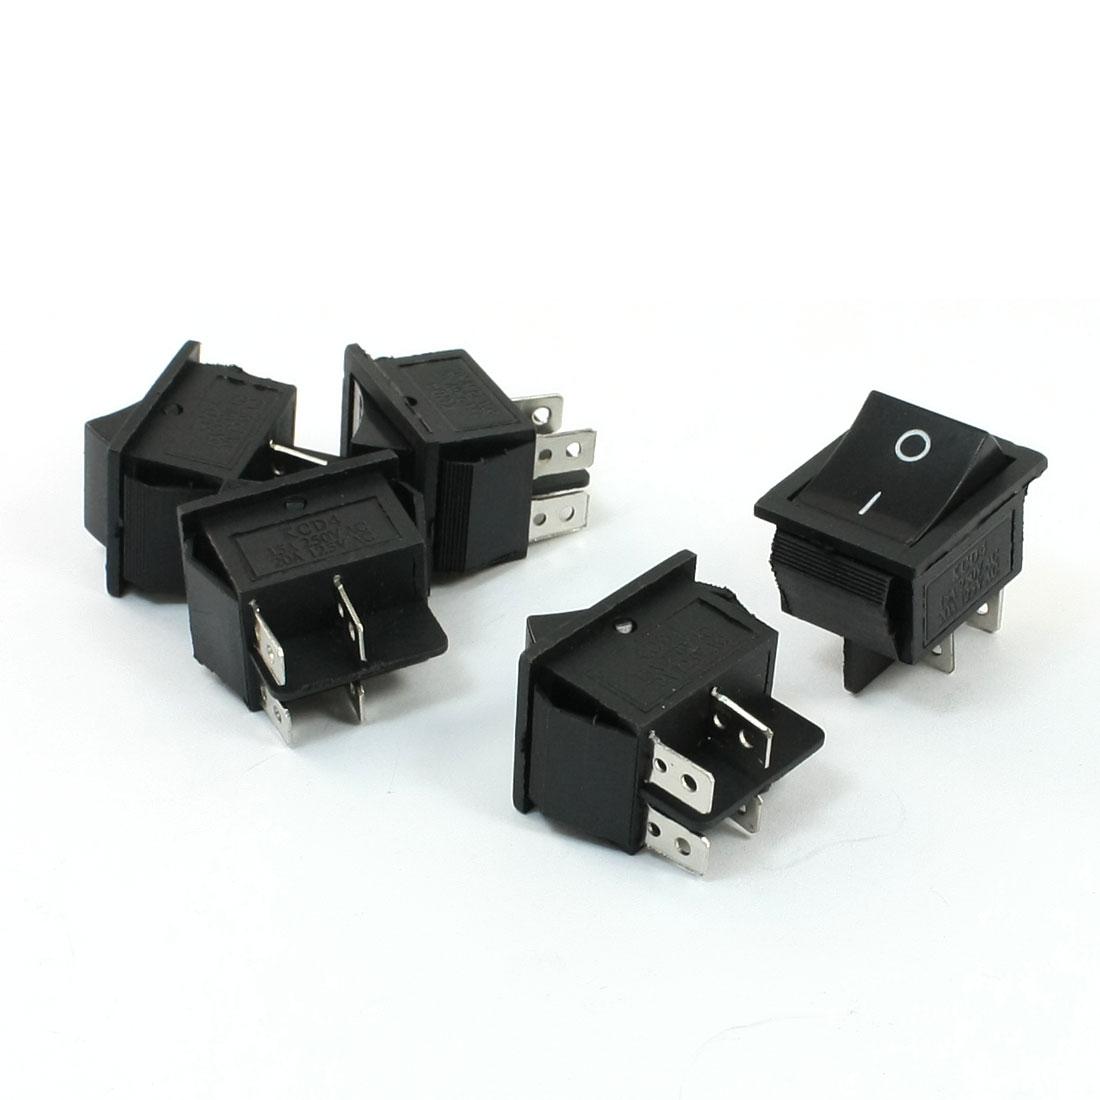 15A 250VAC 20A 125VAC 4 Pin DPST I/O ON/OFF Rocker Switch 5 Pcs